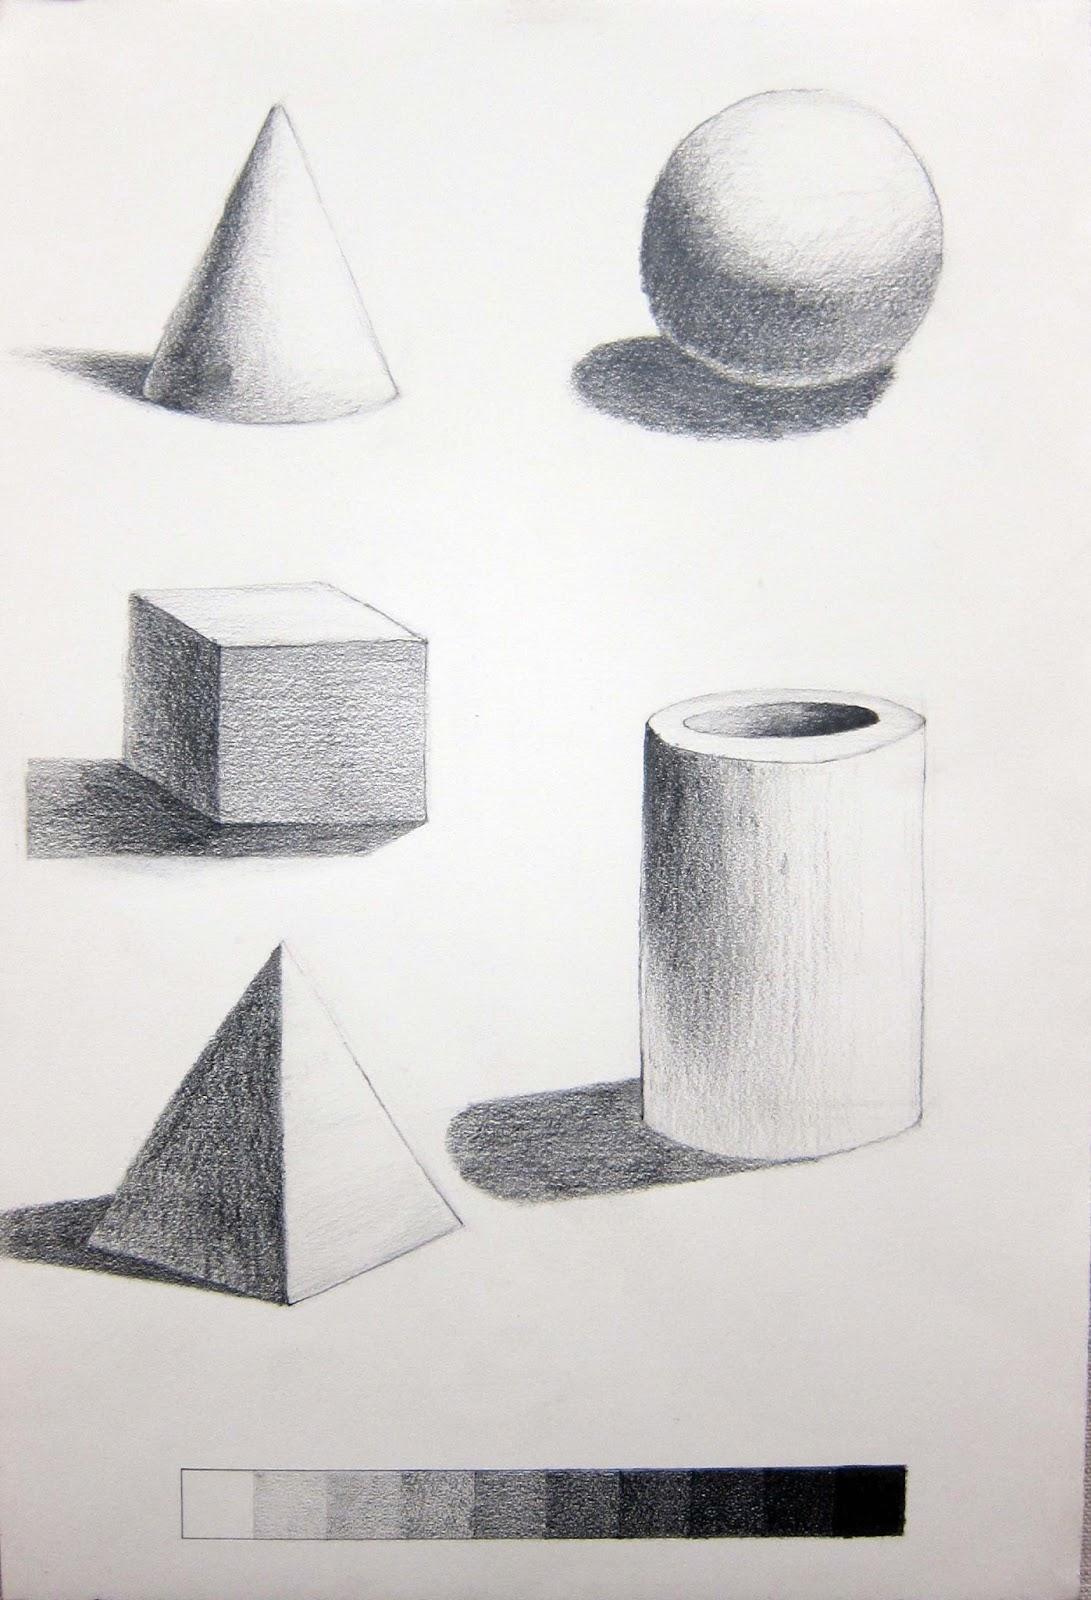 Drawn pyramid pencil Smith Teach and Art7A with